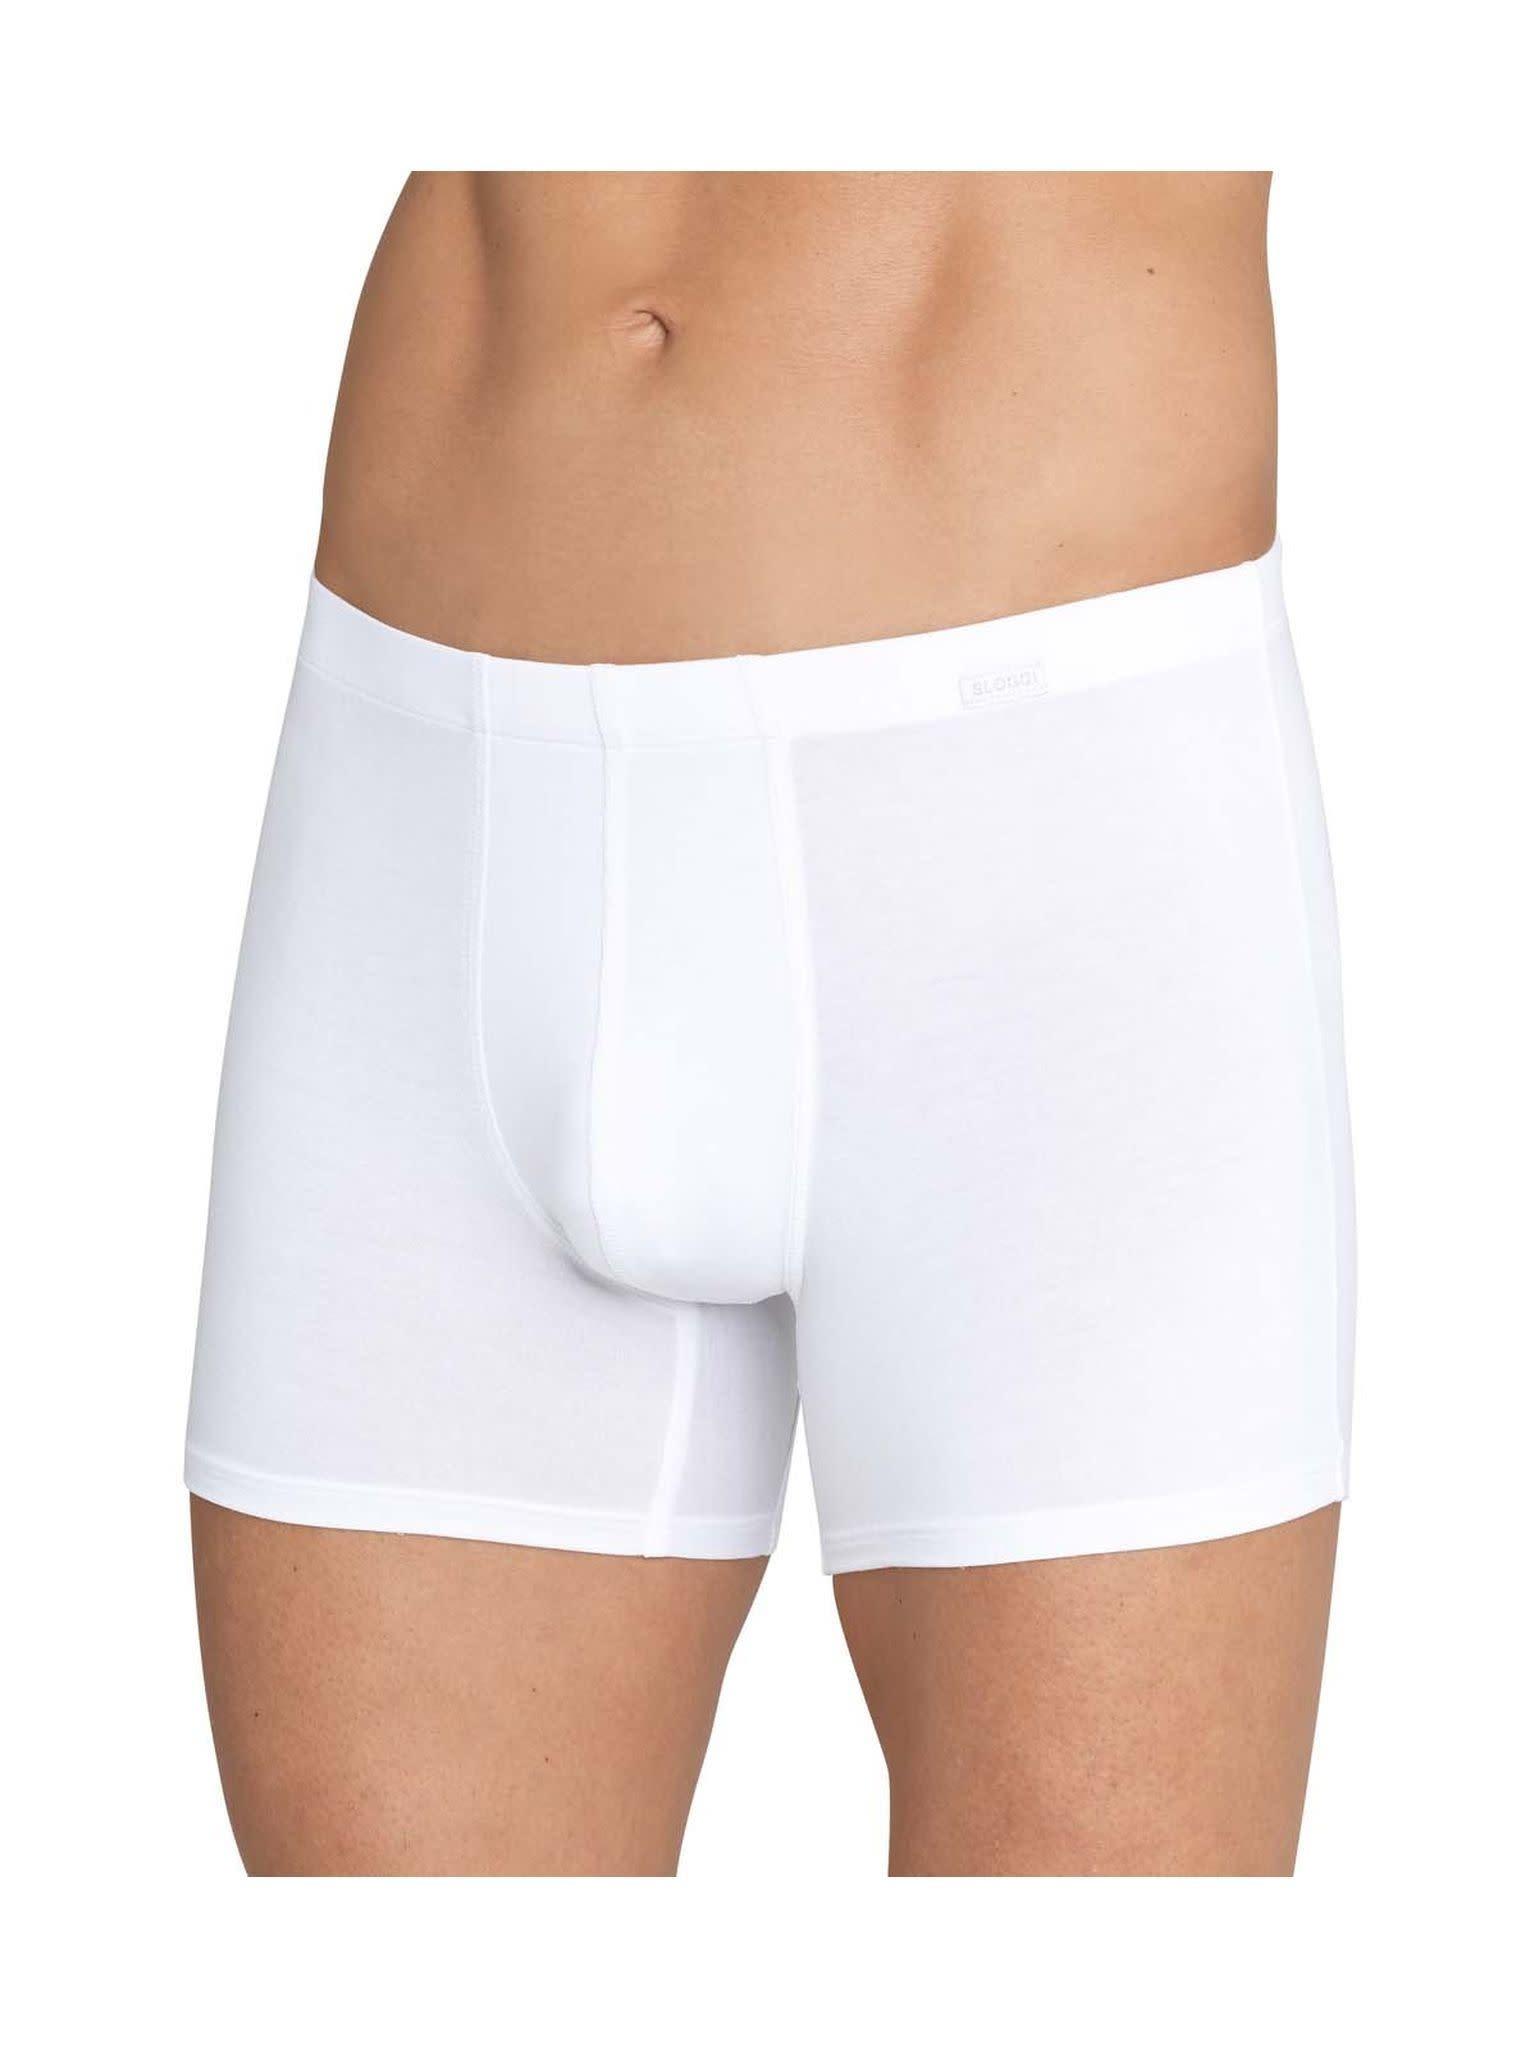 Short Basic Soft 10167209 - wit-1